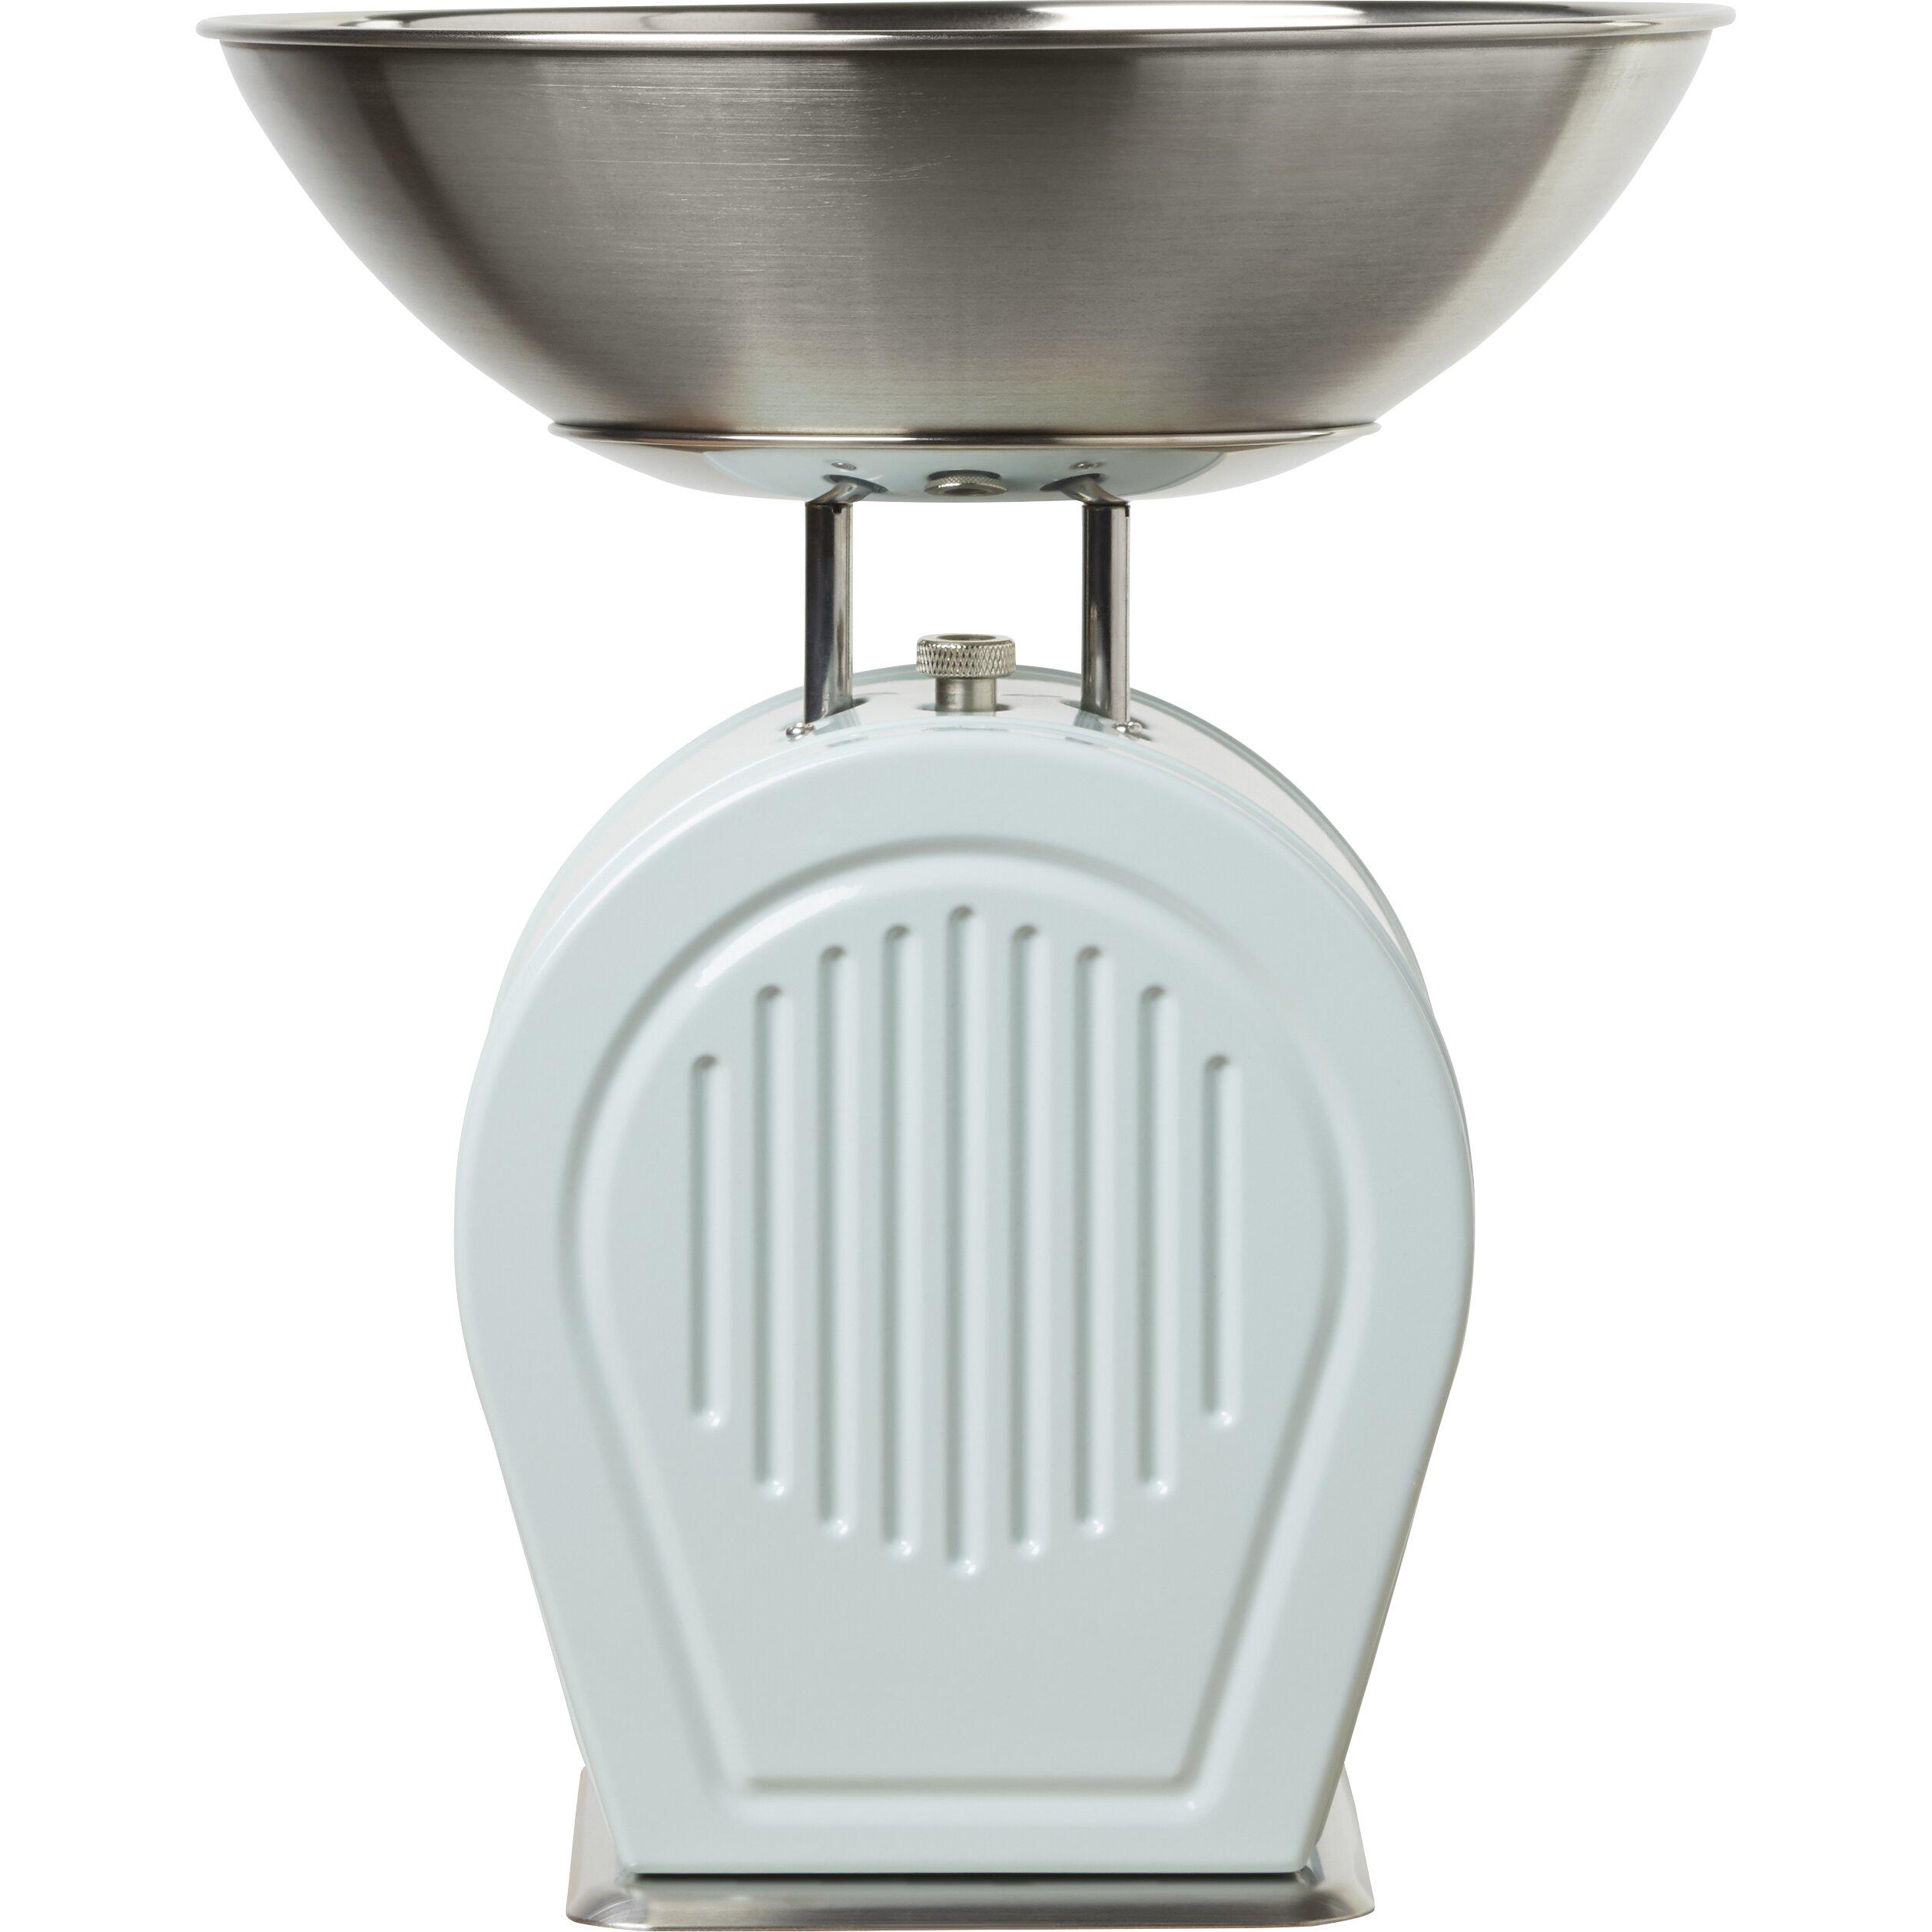 Uncategorized Nostalgic Kitchen Appliances kitchen craft living nostalgia mechanical scale reviews reviews